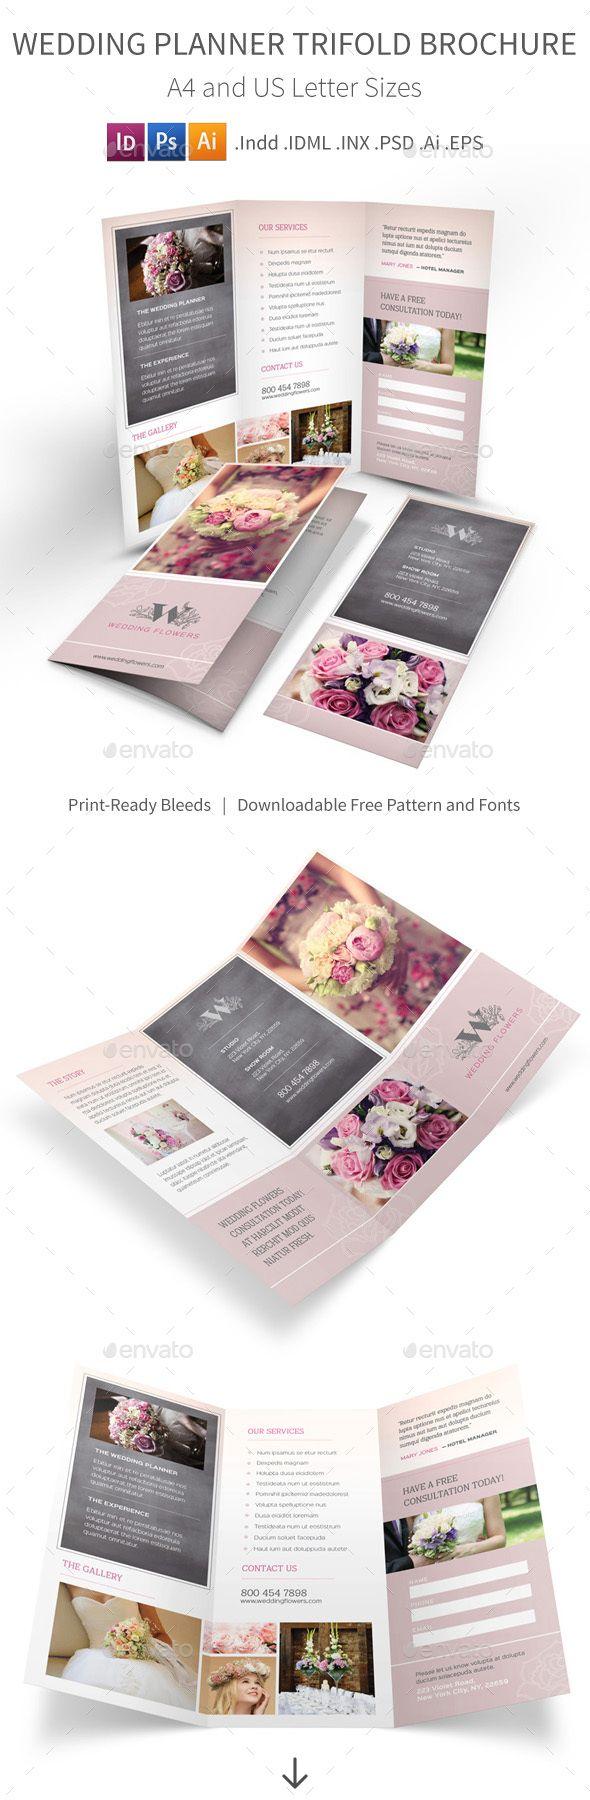 Wedding Planner Trifold Brochure